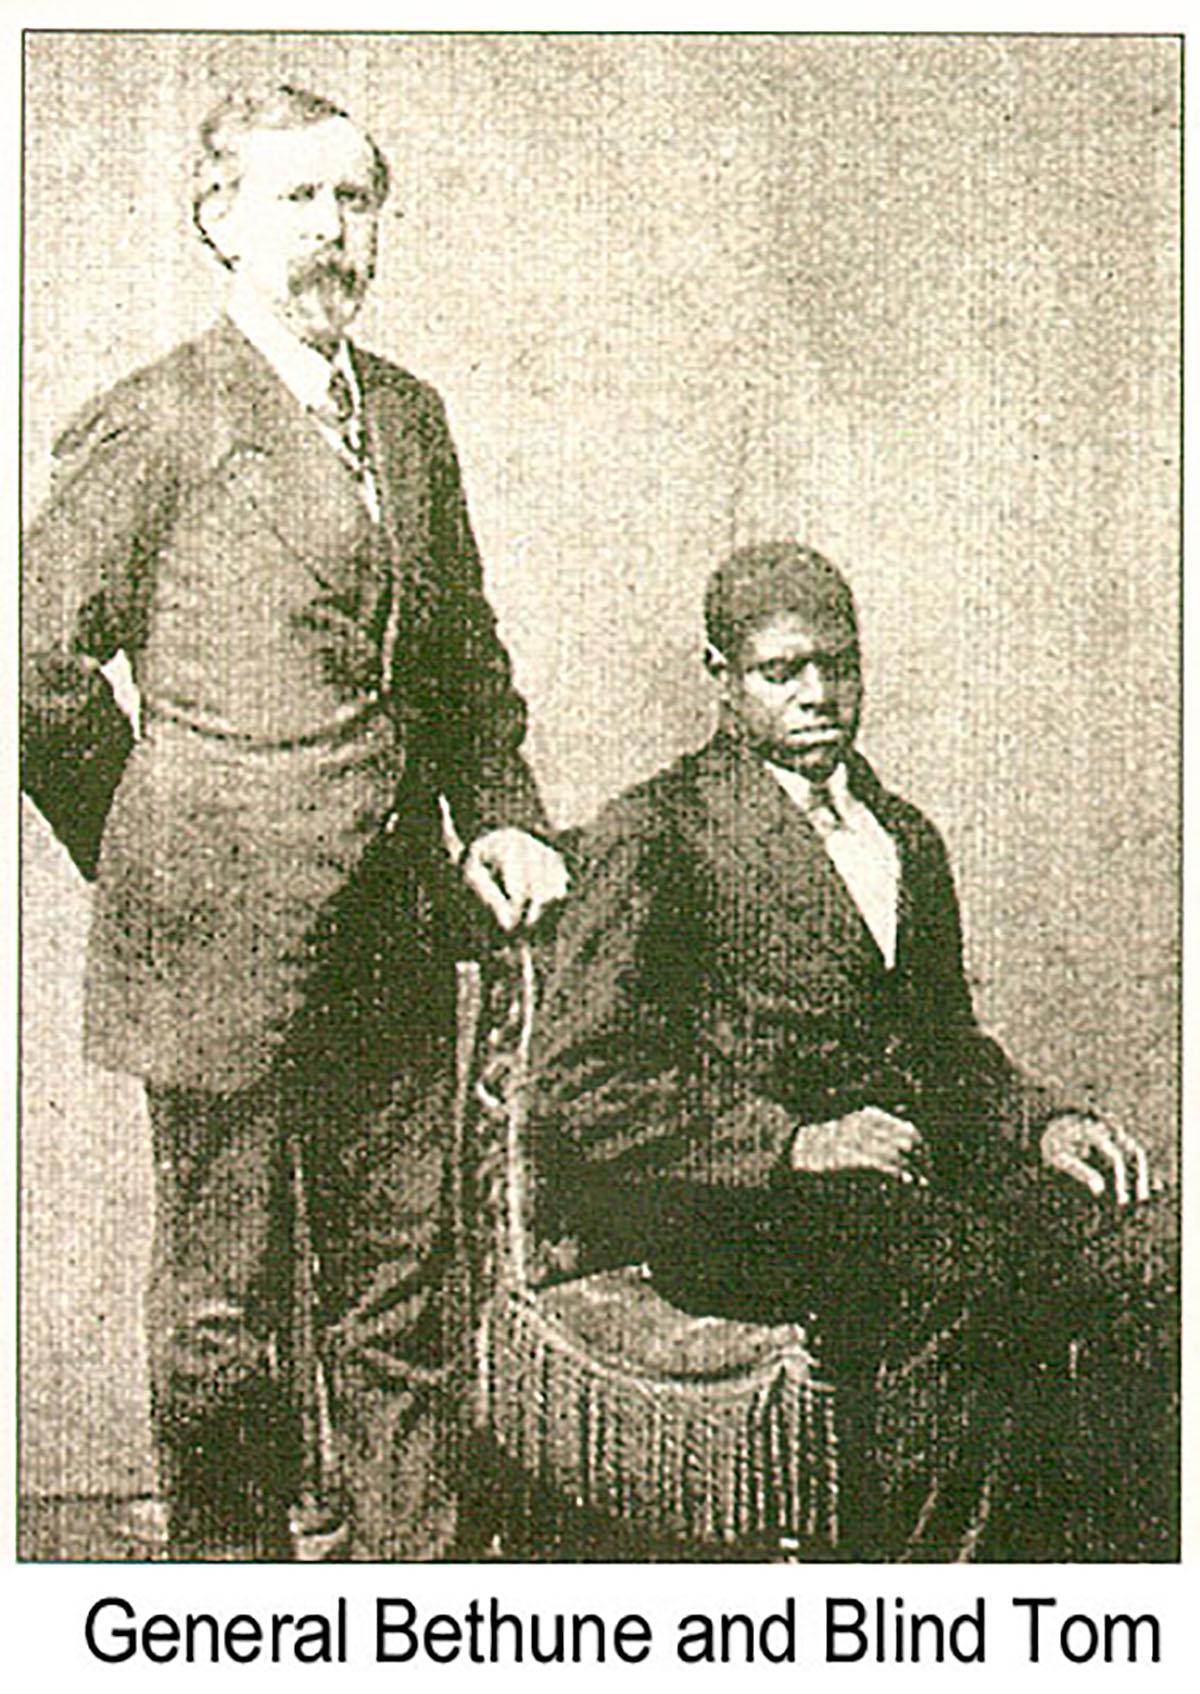 James N. Bethune & Blind Tom picture.jpg